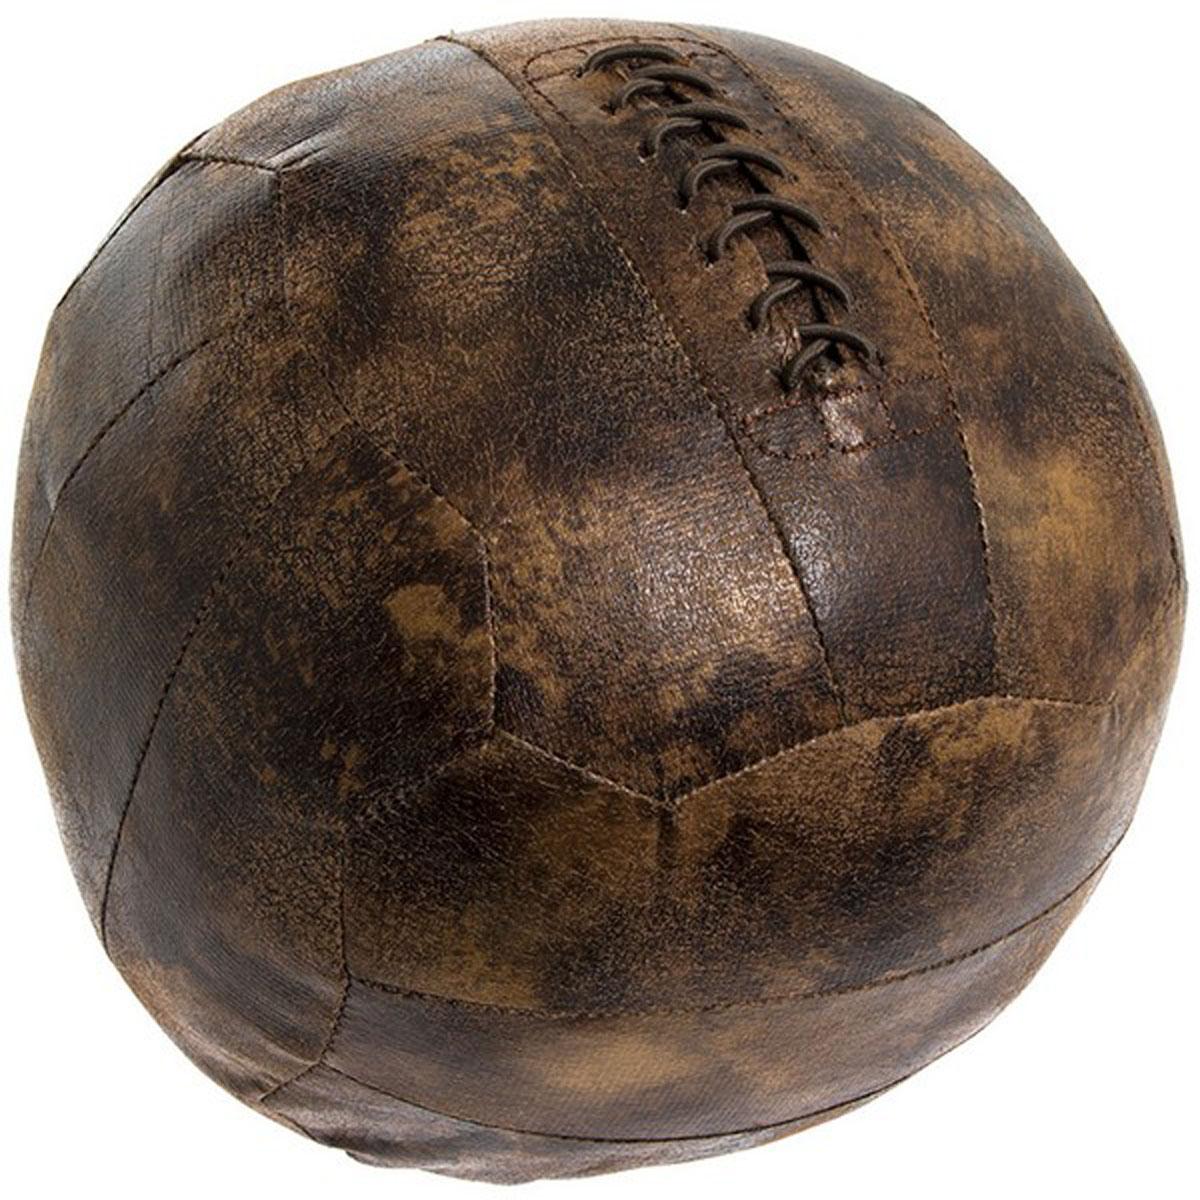 Cale porte façon cuir \'Ballon\' marron - 21 cm - [Q3575]